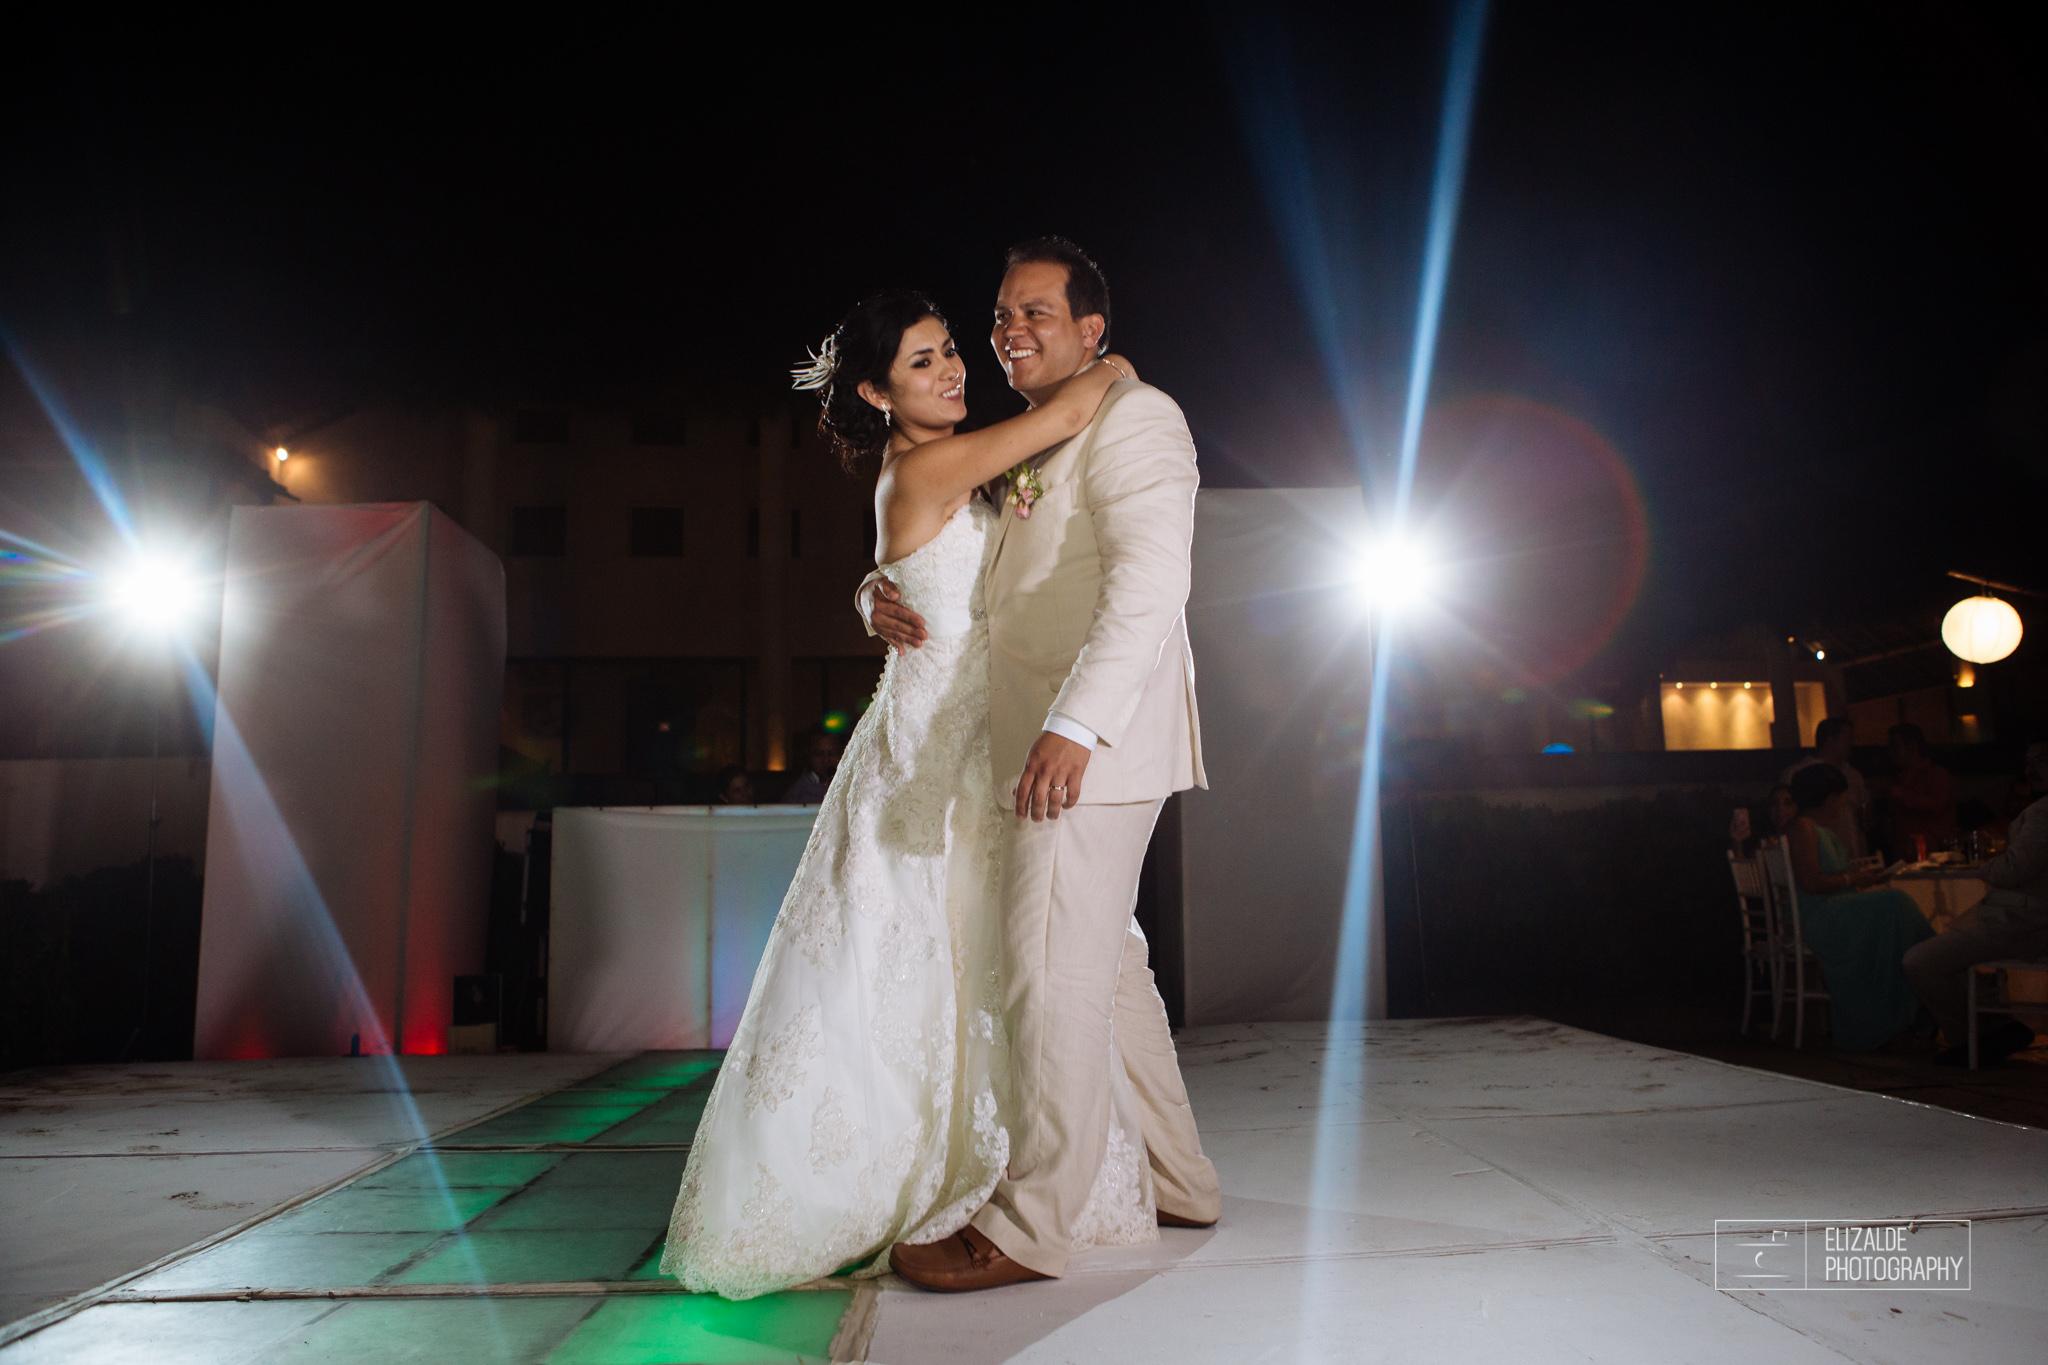 Pay and Ferran_Acapulco_Destination Wedding_Elizalde Photography-115.jpg